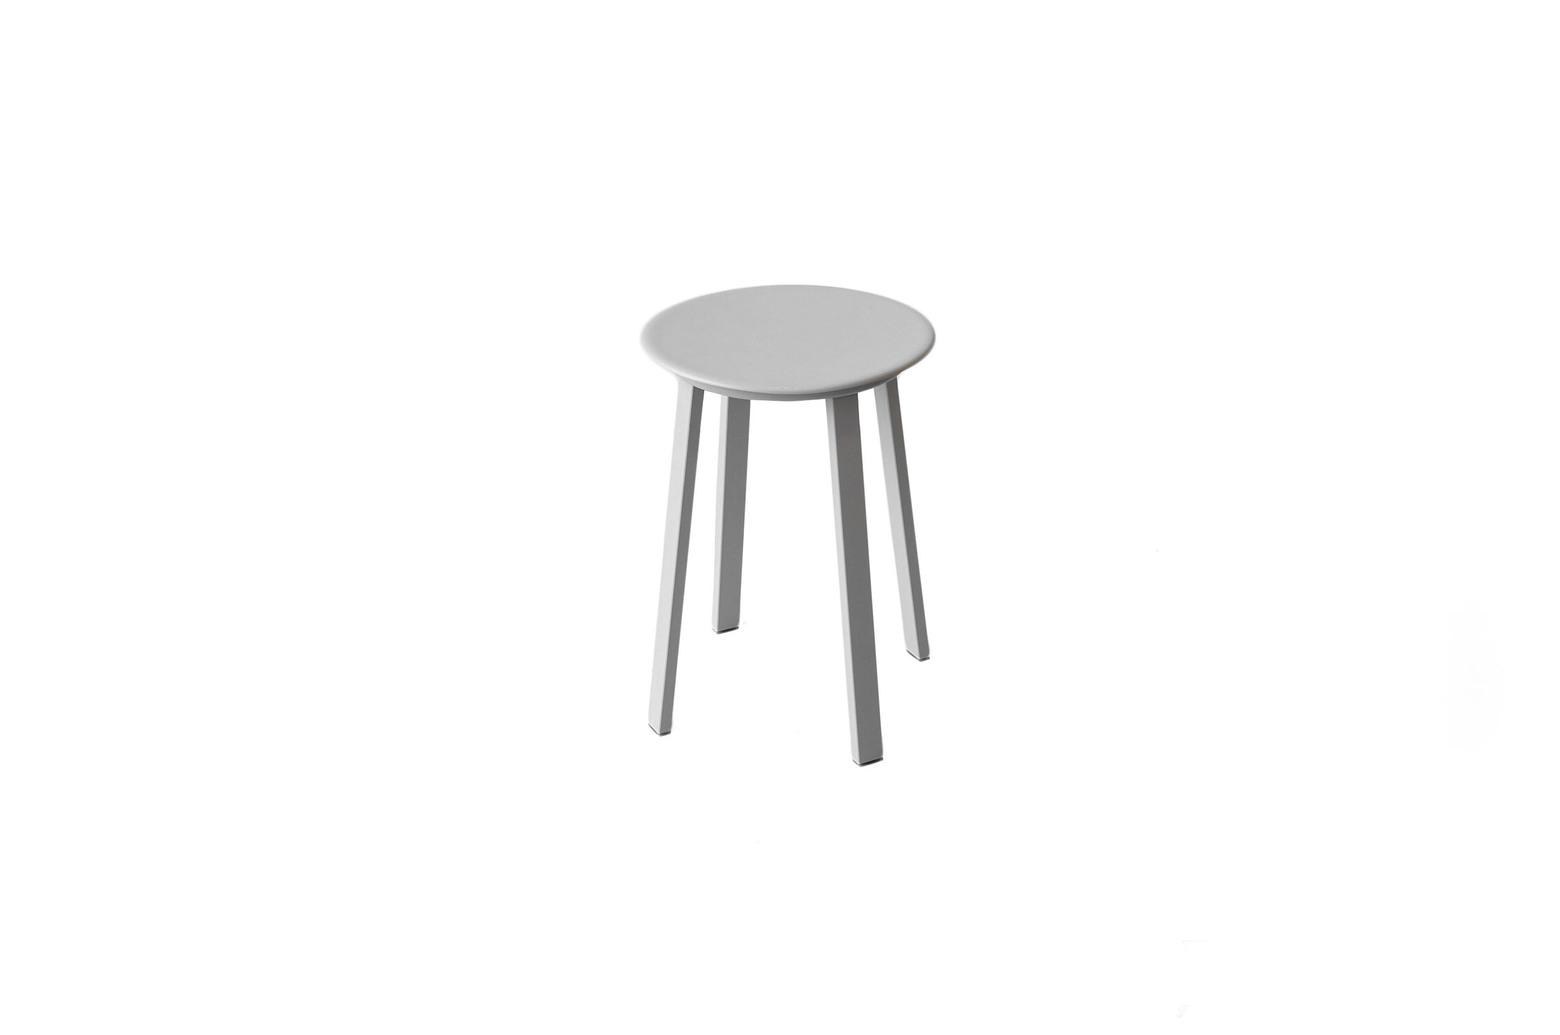 HAY REVOLVER STOOL/ヘイ リボルバースツール 回転椅子 インダストリアル モダン 北欧デザイン